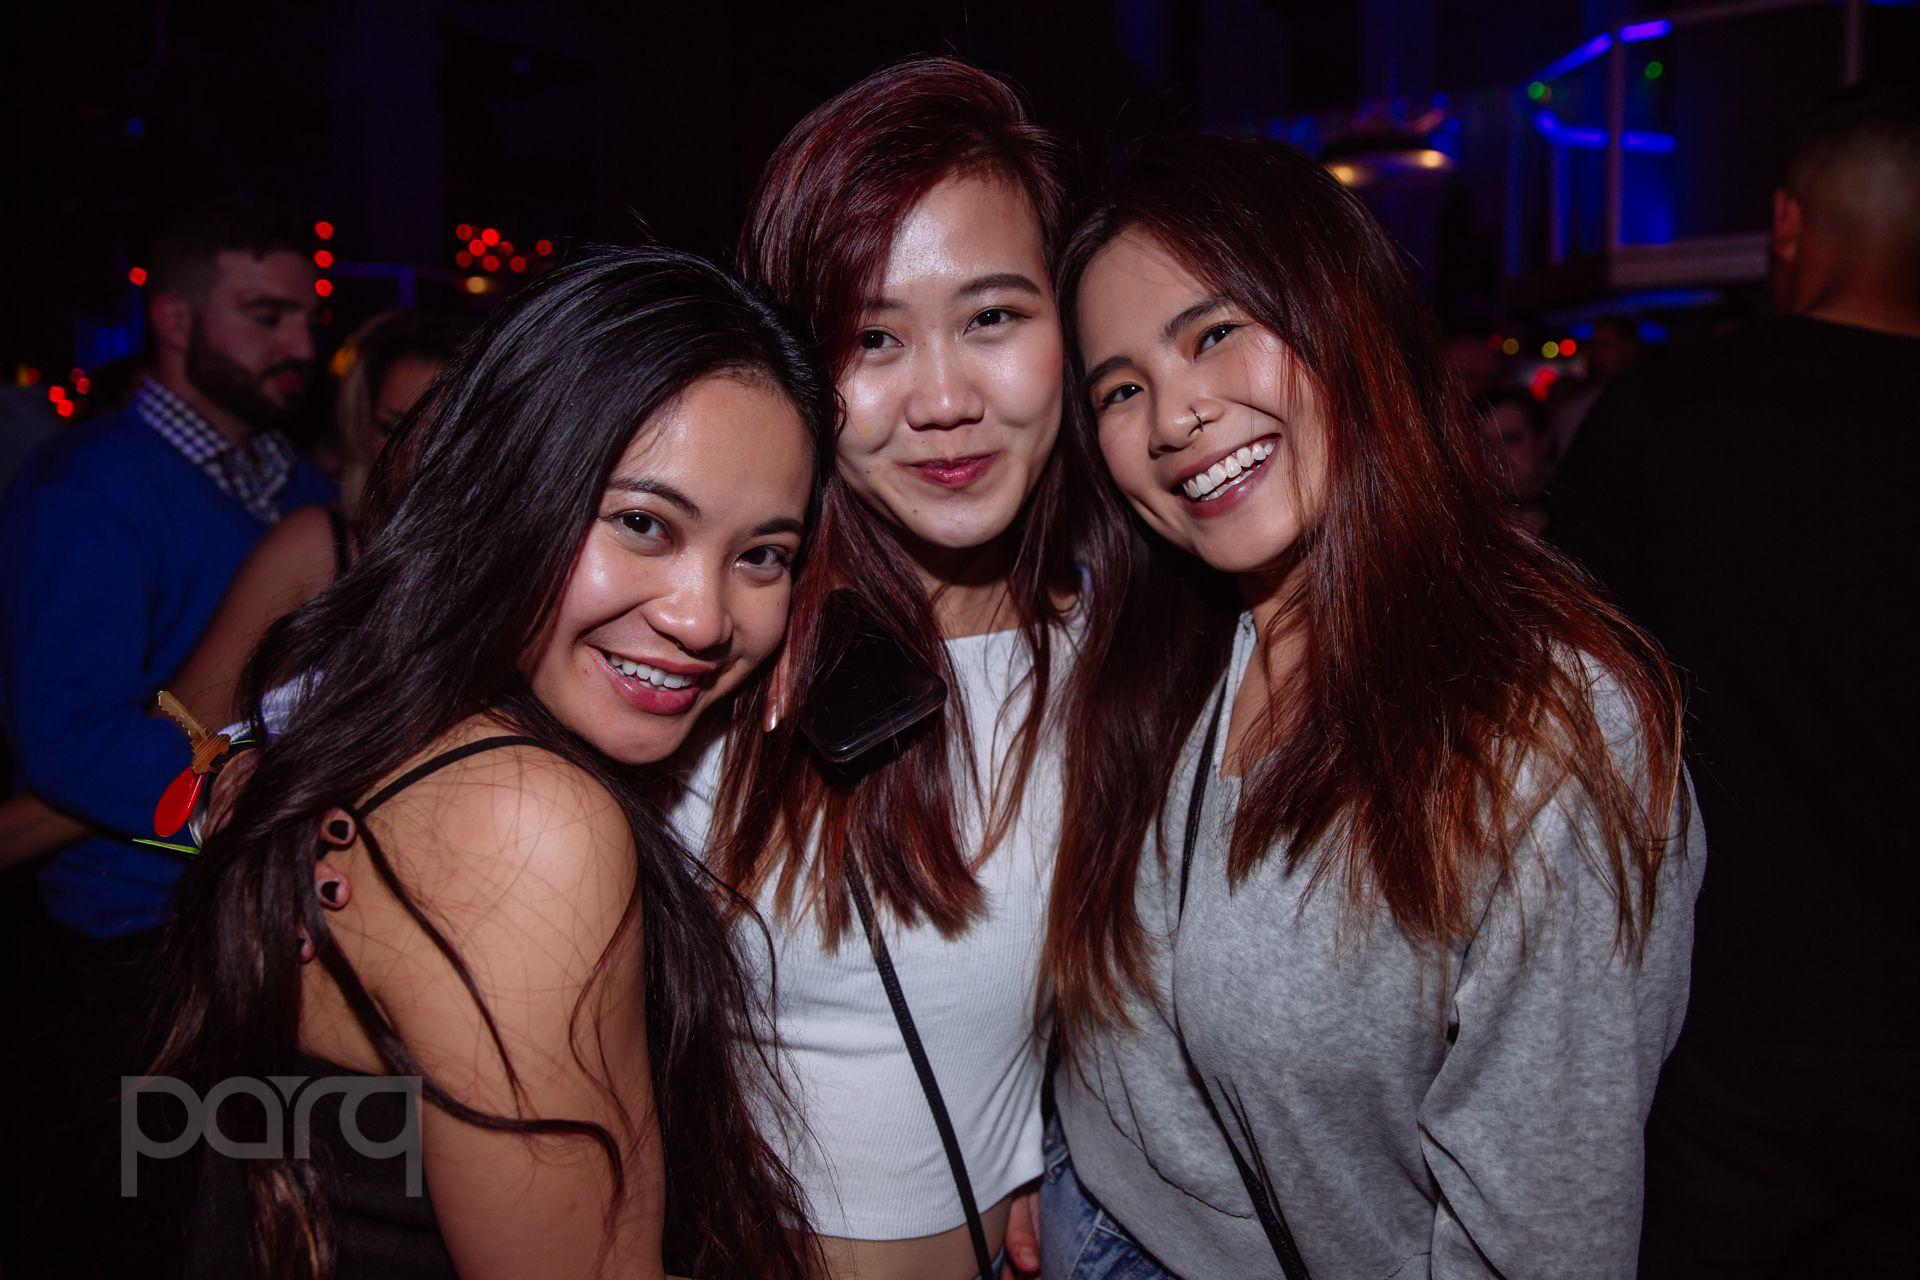 01.19.18 Parq - DJ Hollywood-27.jpg